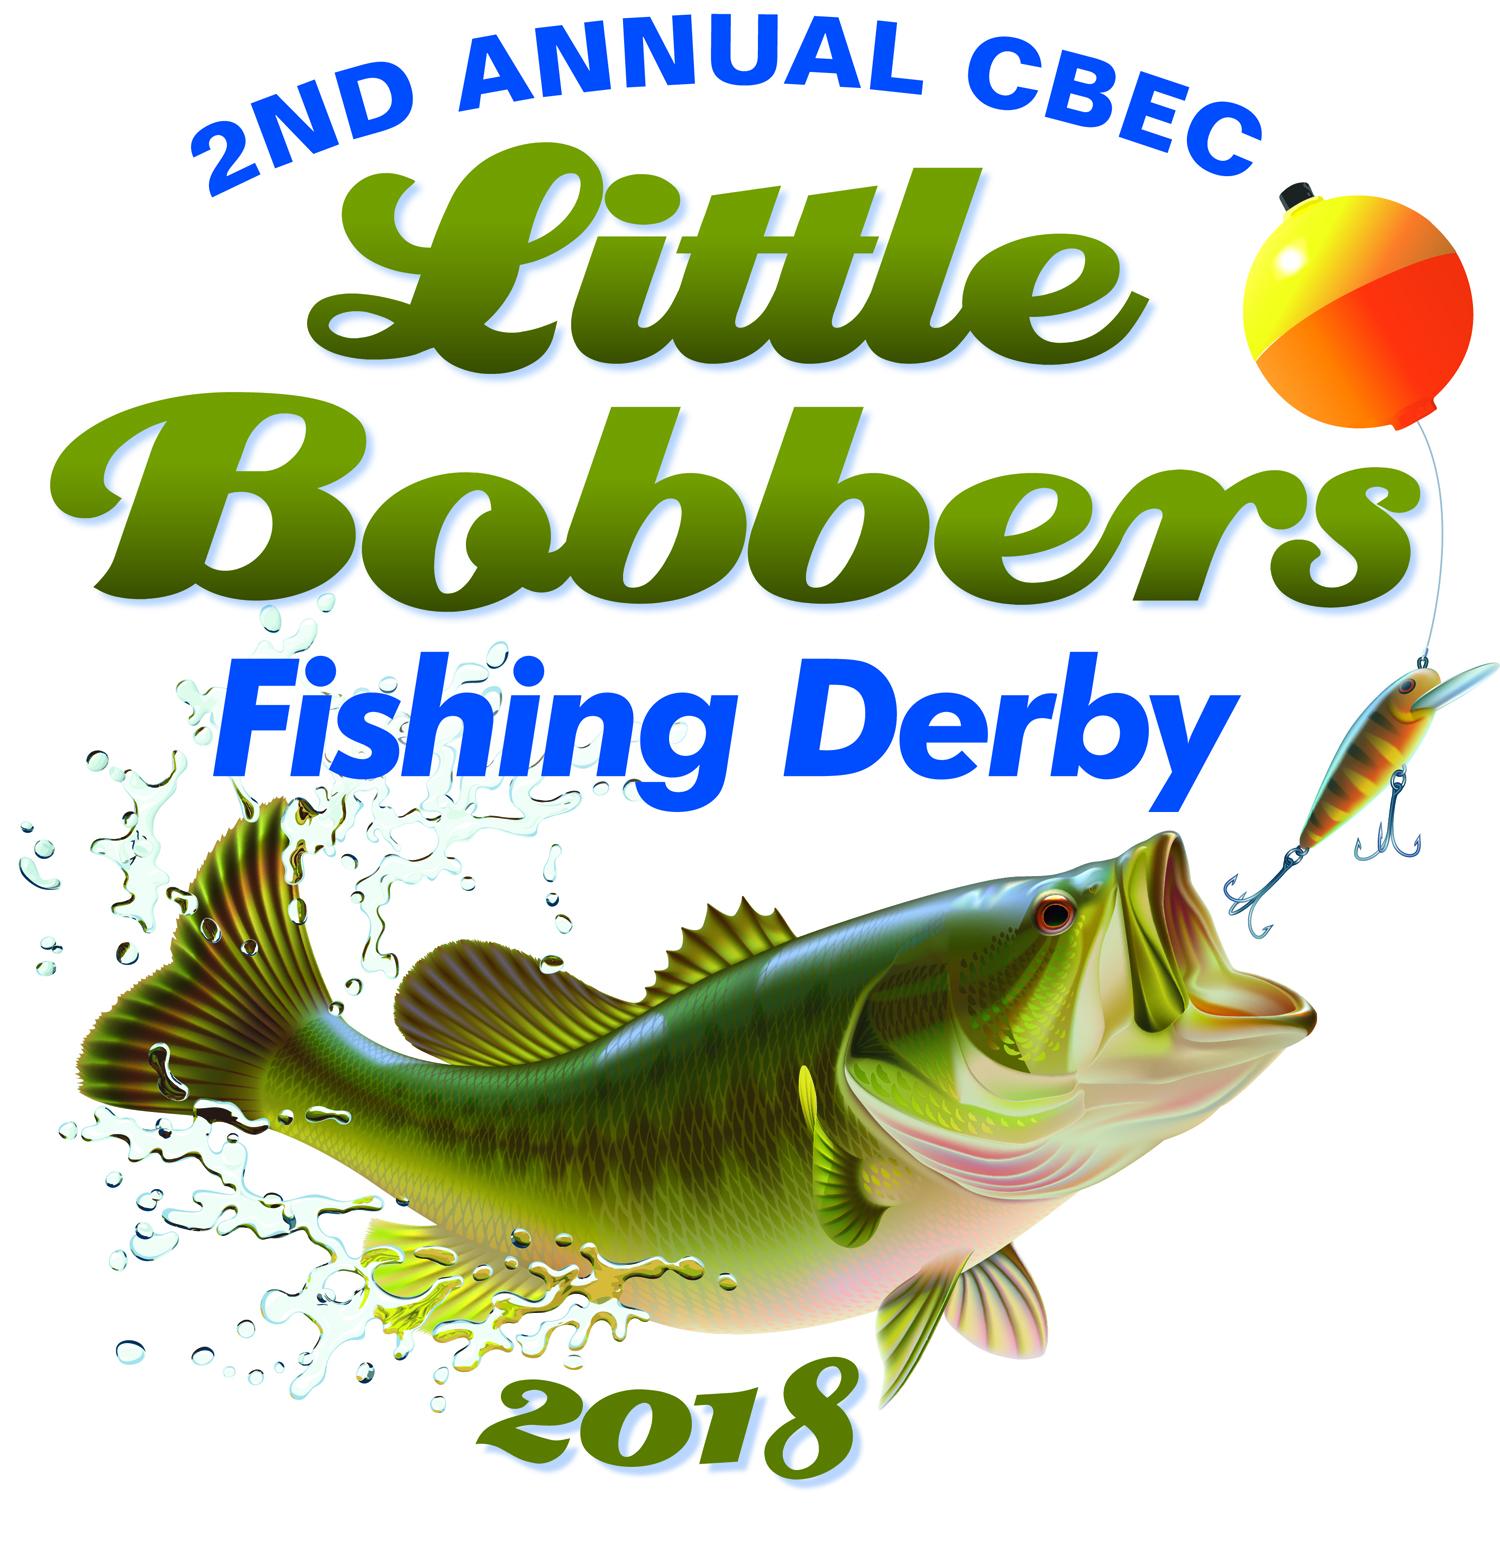 Bayrestoration org. Bass clipart fishing derby